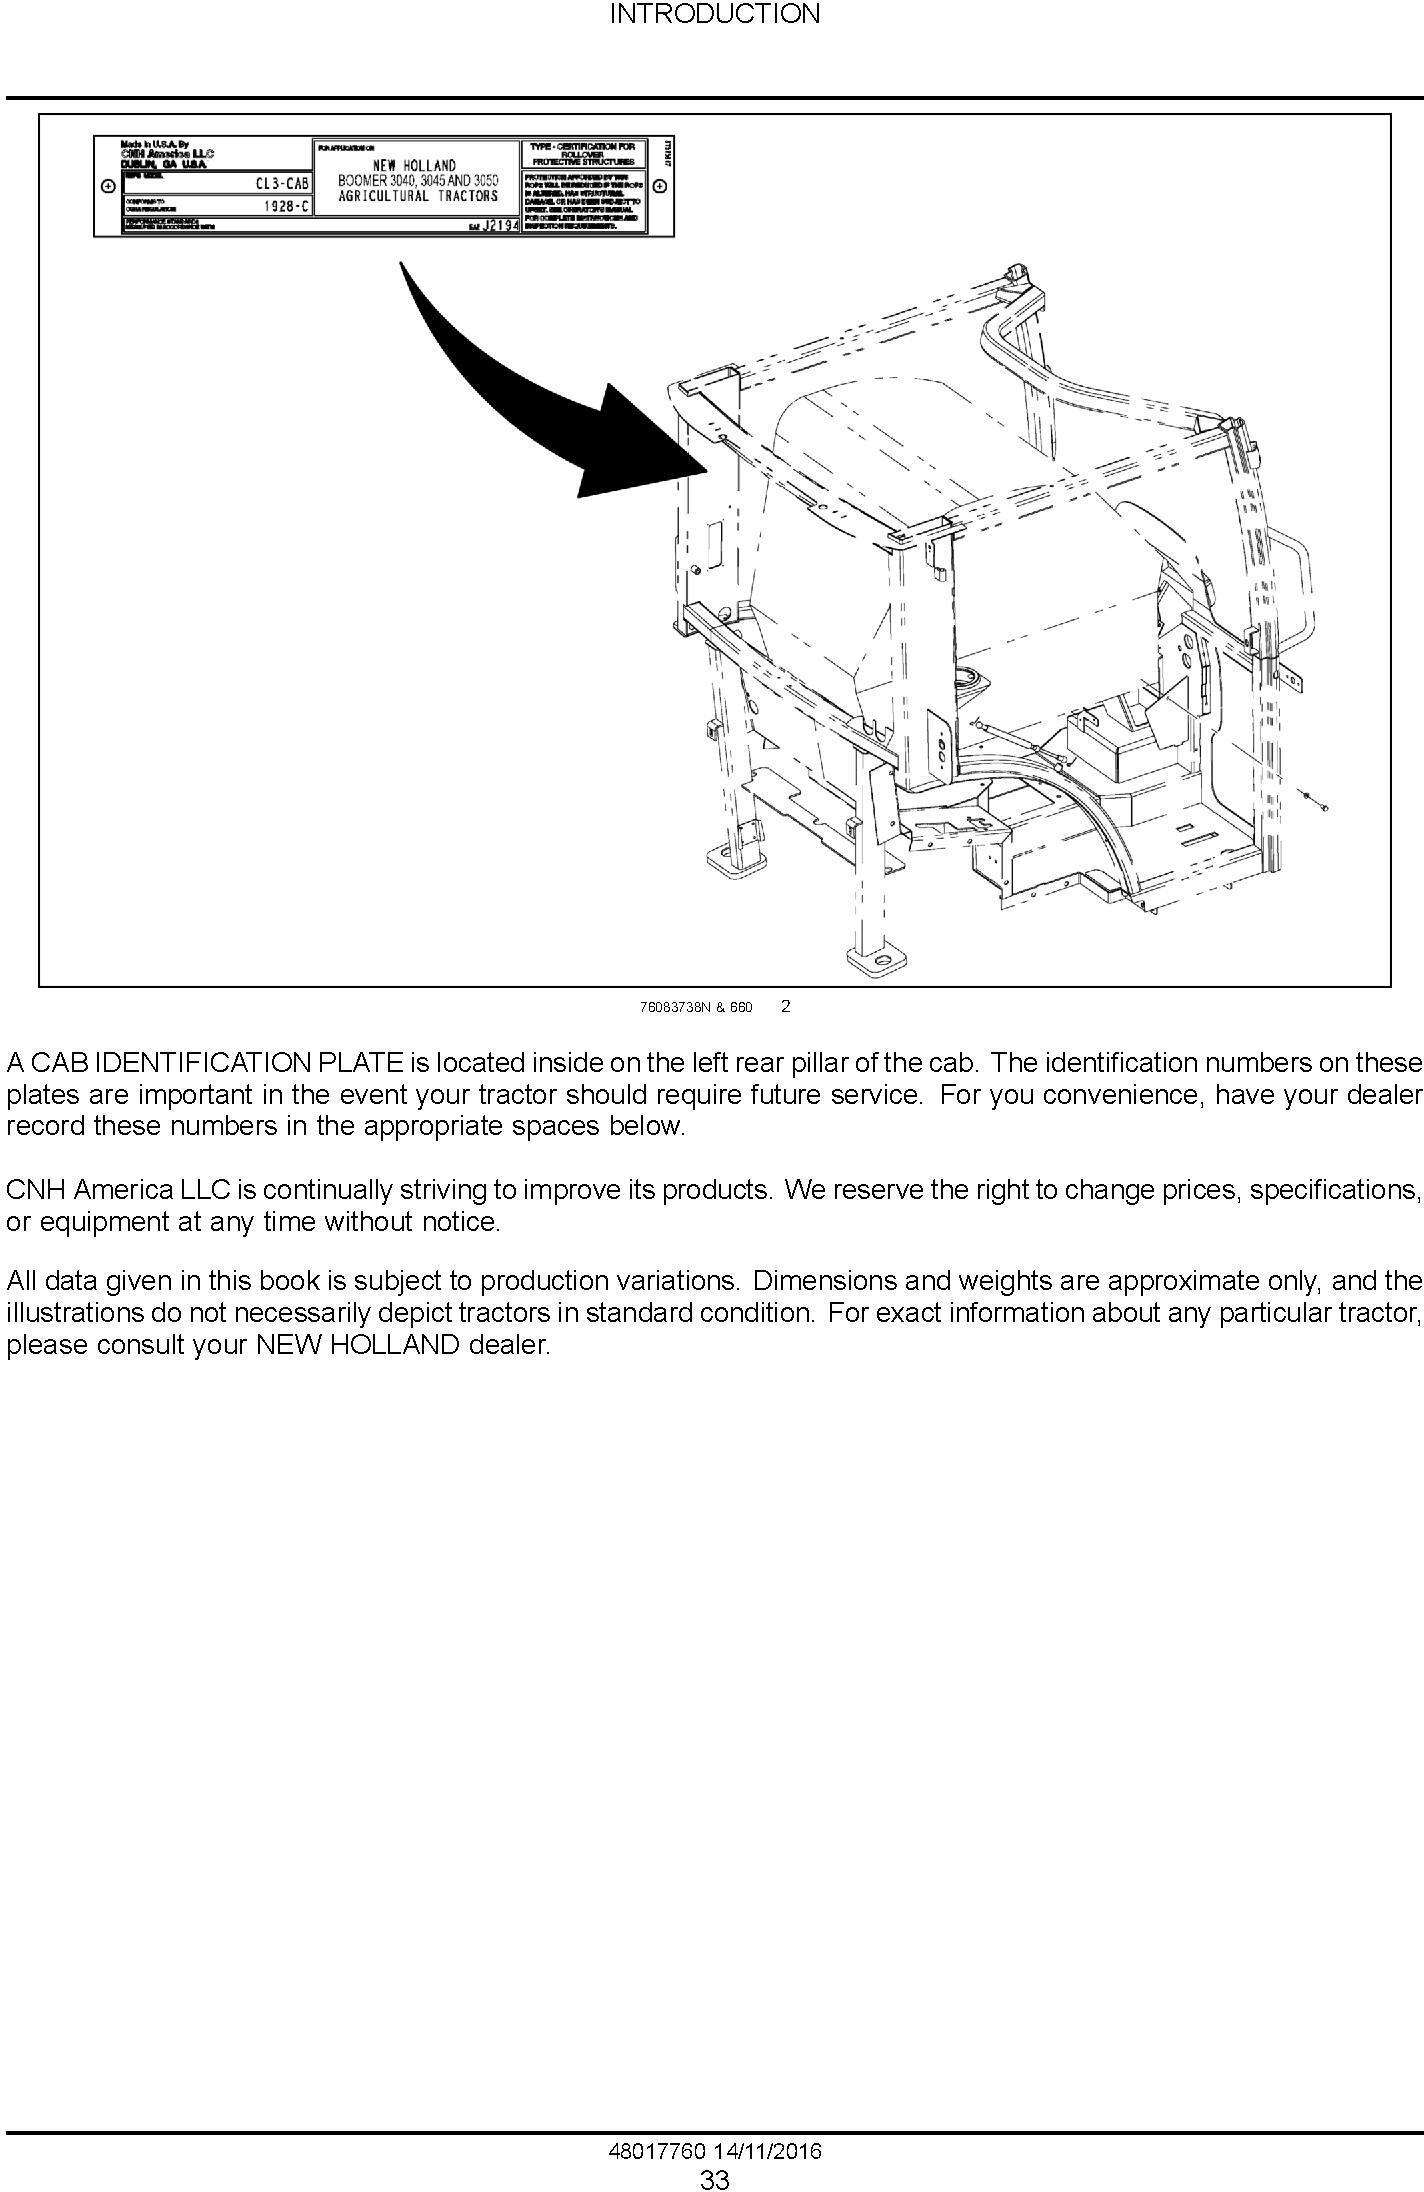 New Holland Boomer 3040 CVT, 3045 CVT, 3050 CVT Compact Tractor Service Manual (Europe) - 1